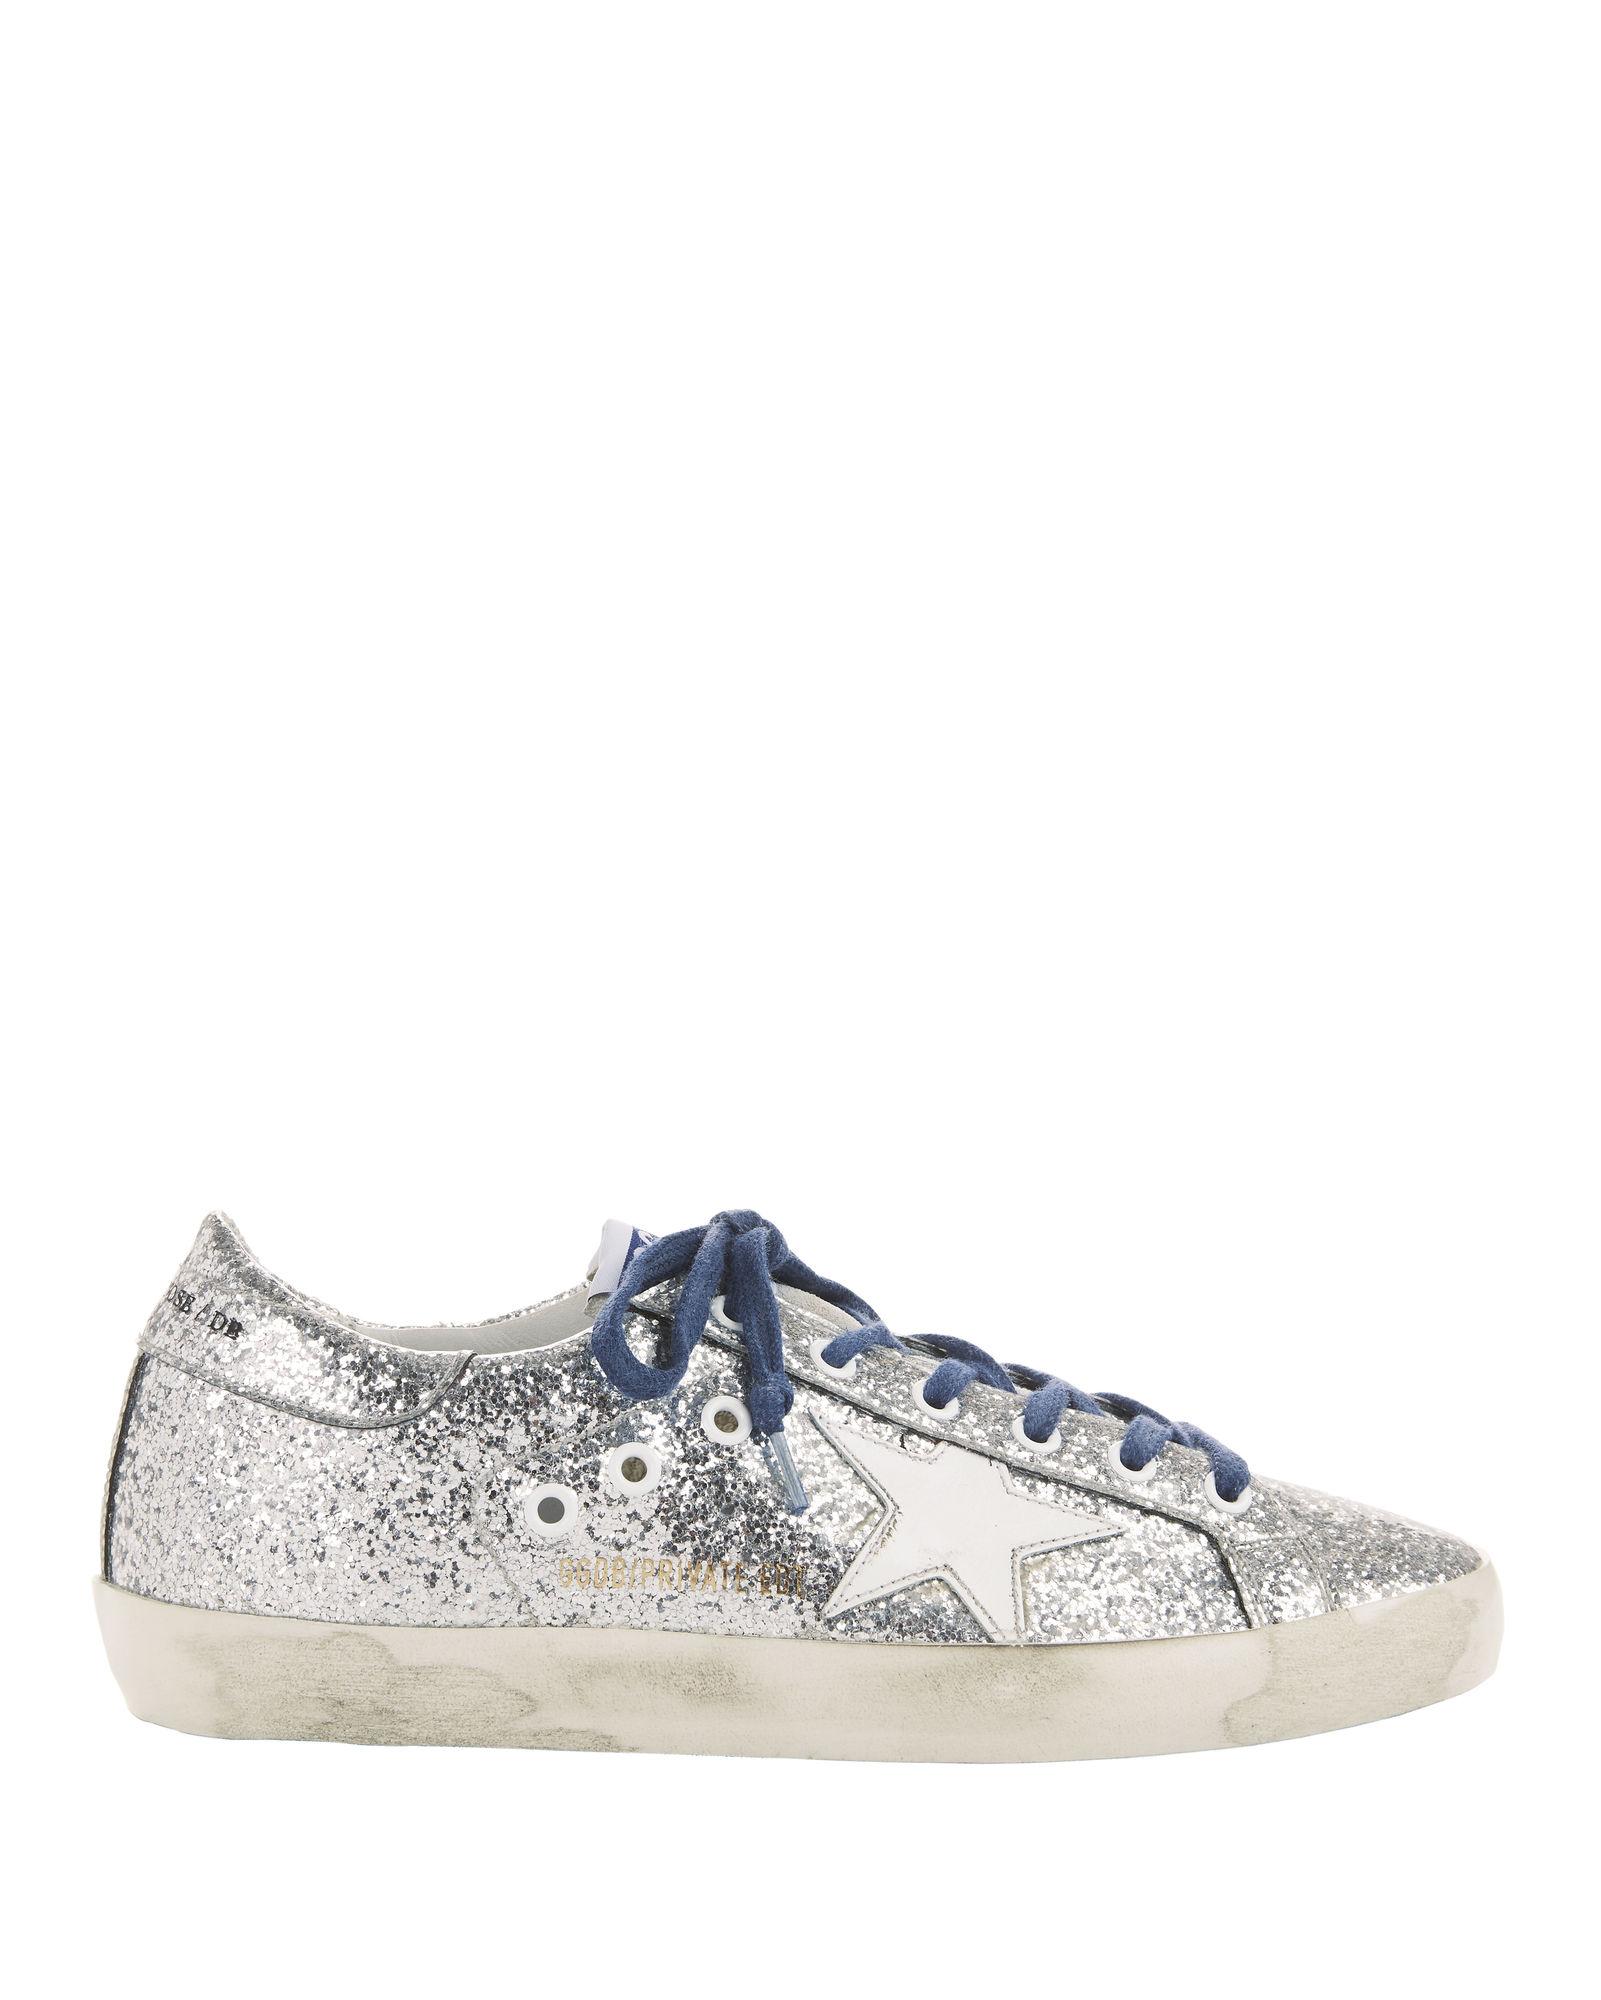 Golden Goose Superstar Blue Lace Silver Glitter Sneakers